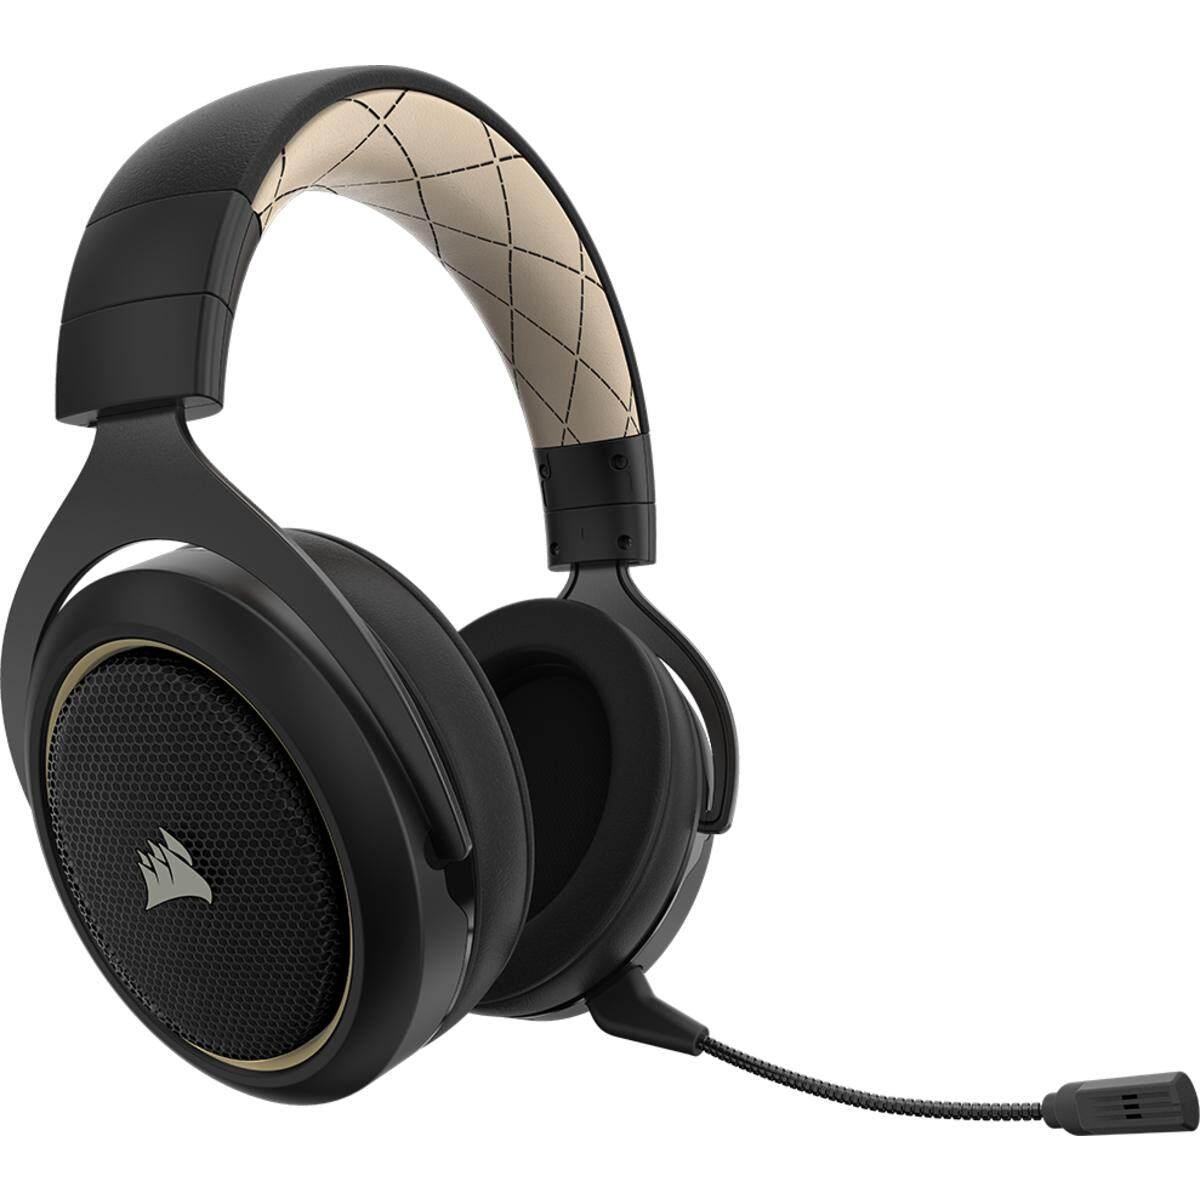 Corsair HS70 Wireless Gaming Headset (Carbon/White/SE)